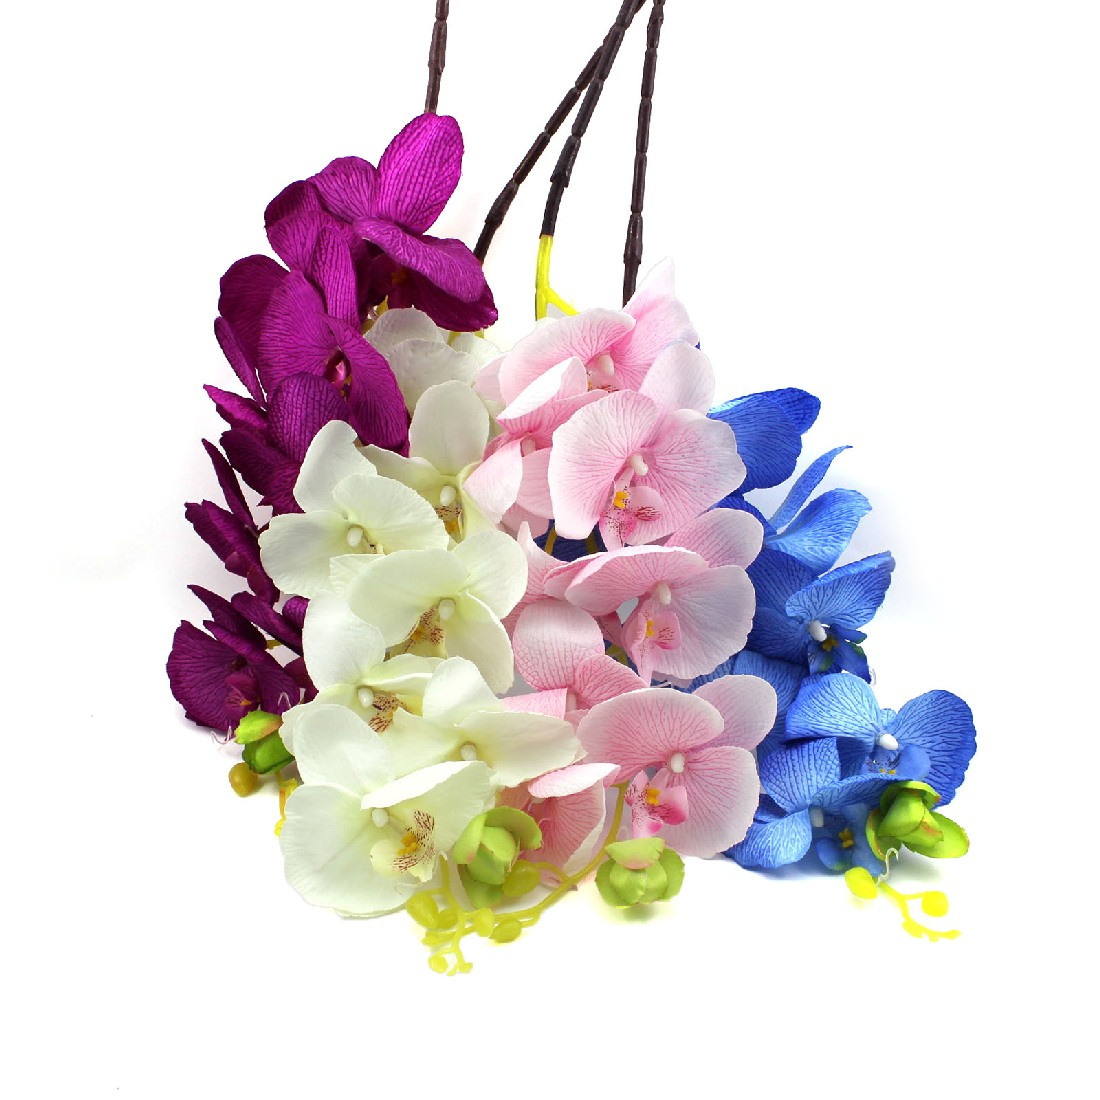 Online buy wholesale silk orchid arrangements from china silk beautiful 8pcs artificial fake flower butterfly orchid silk flower home wedding party decor phalaenopsis flower arrangement dhlflorist Gallery